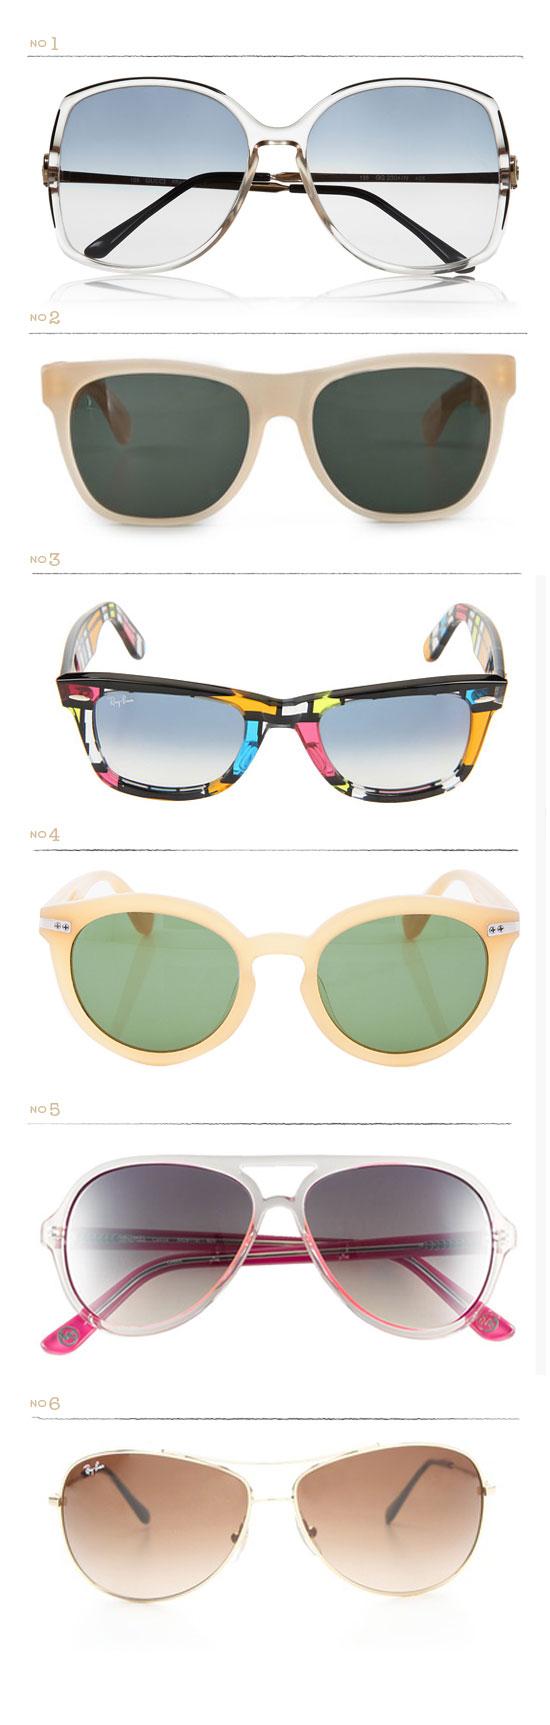 Sunglasses_verysarie